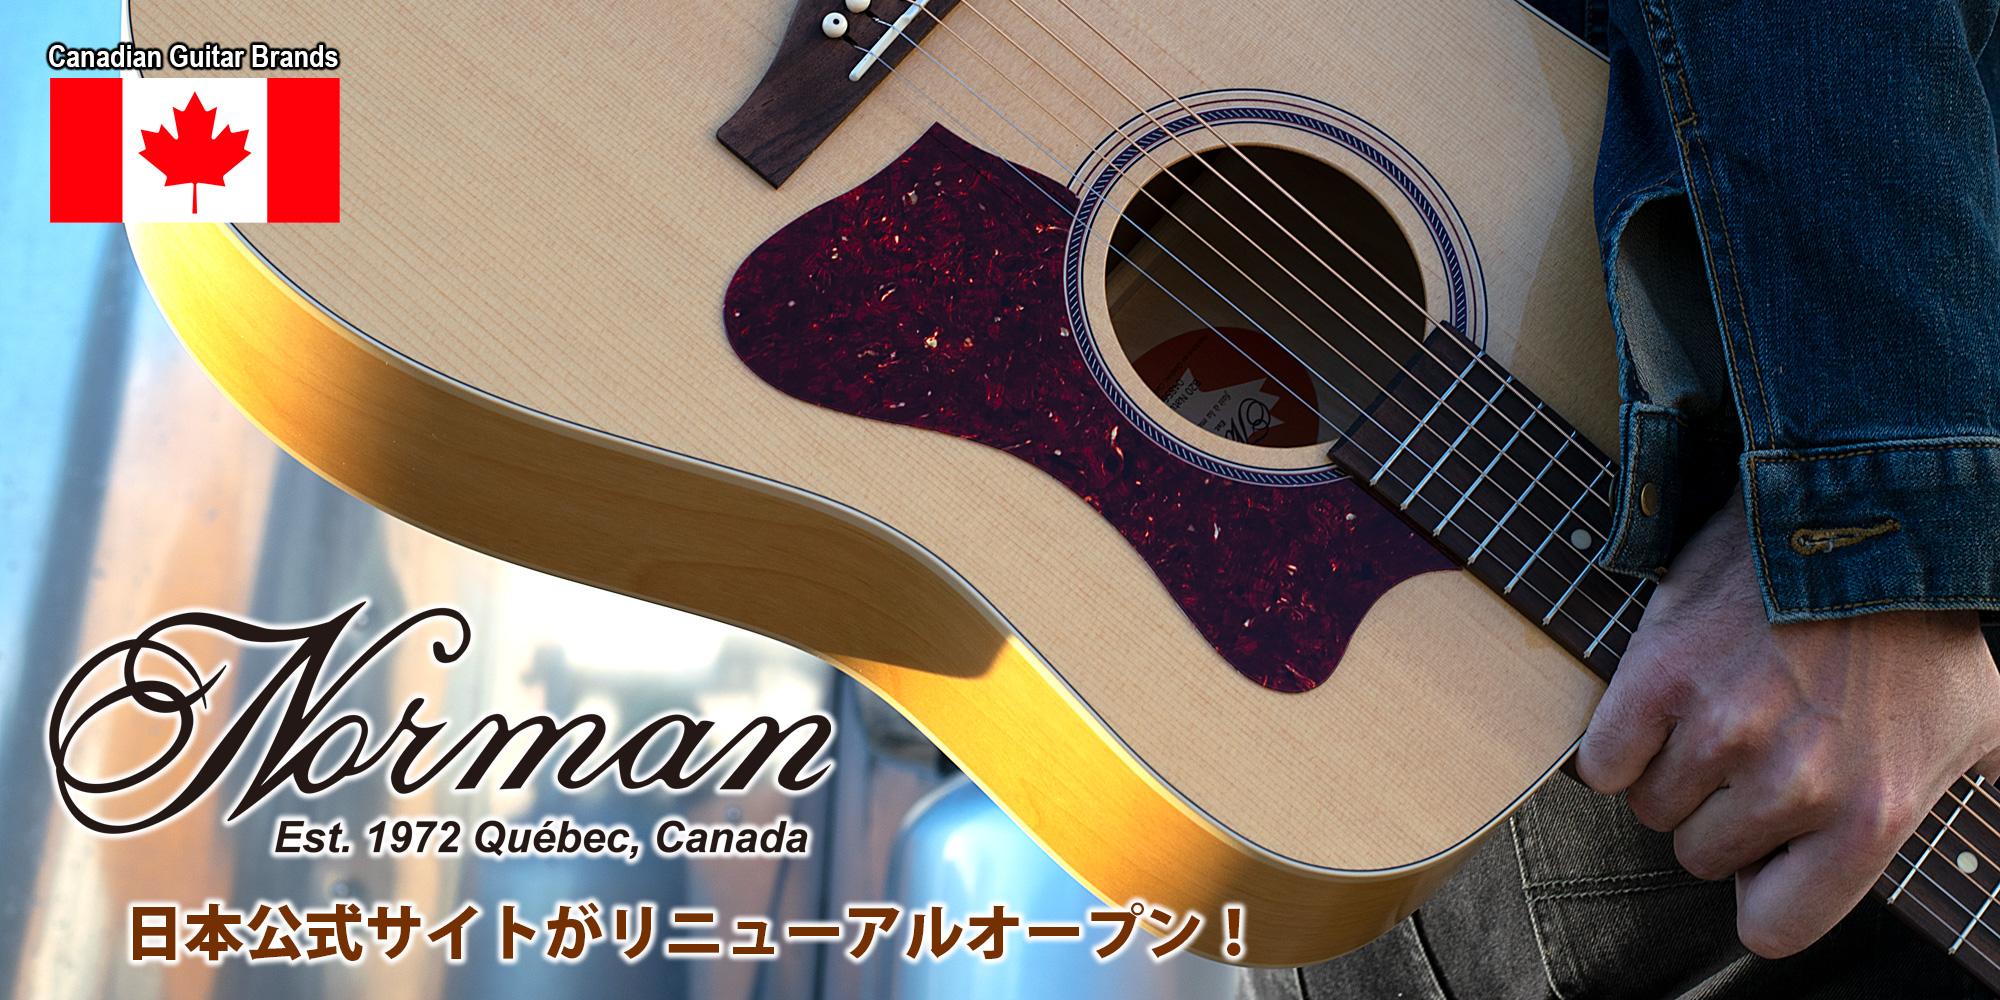 norman_b20_nat_banner